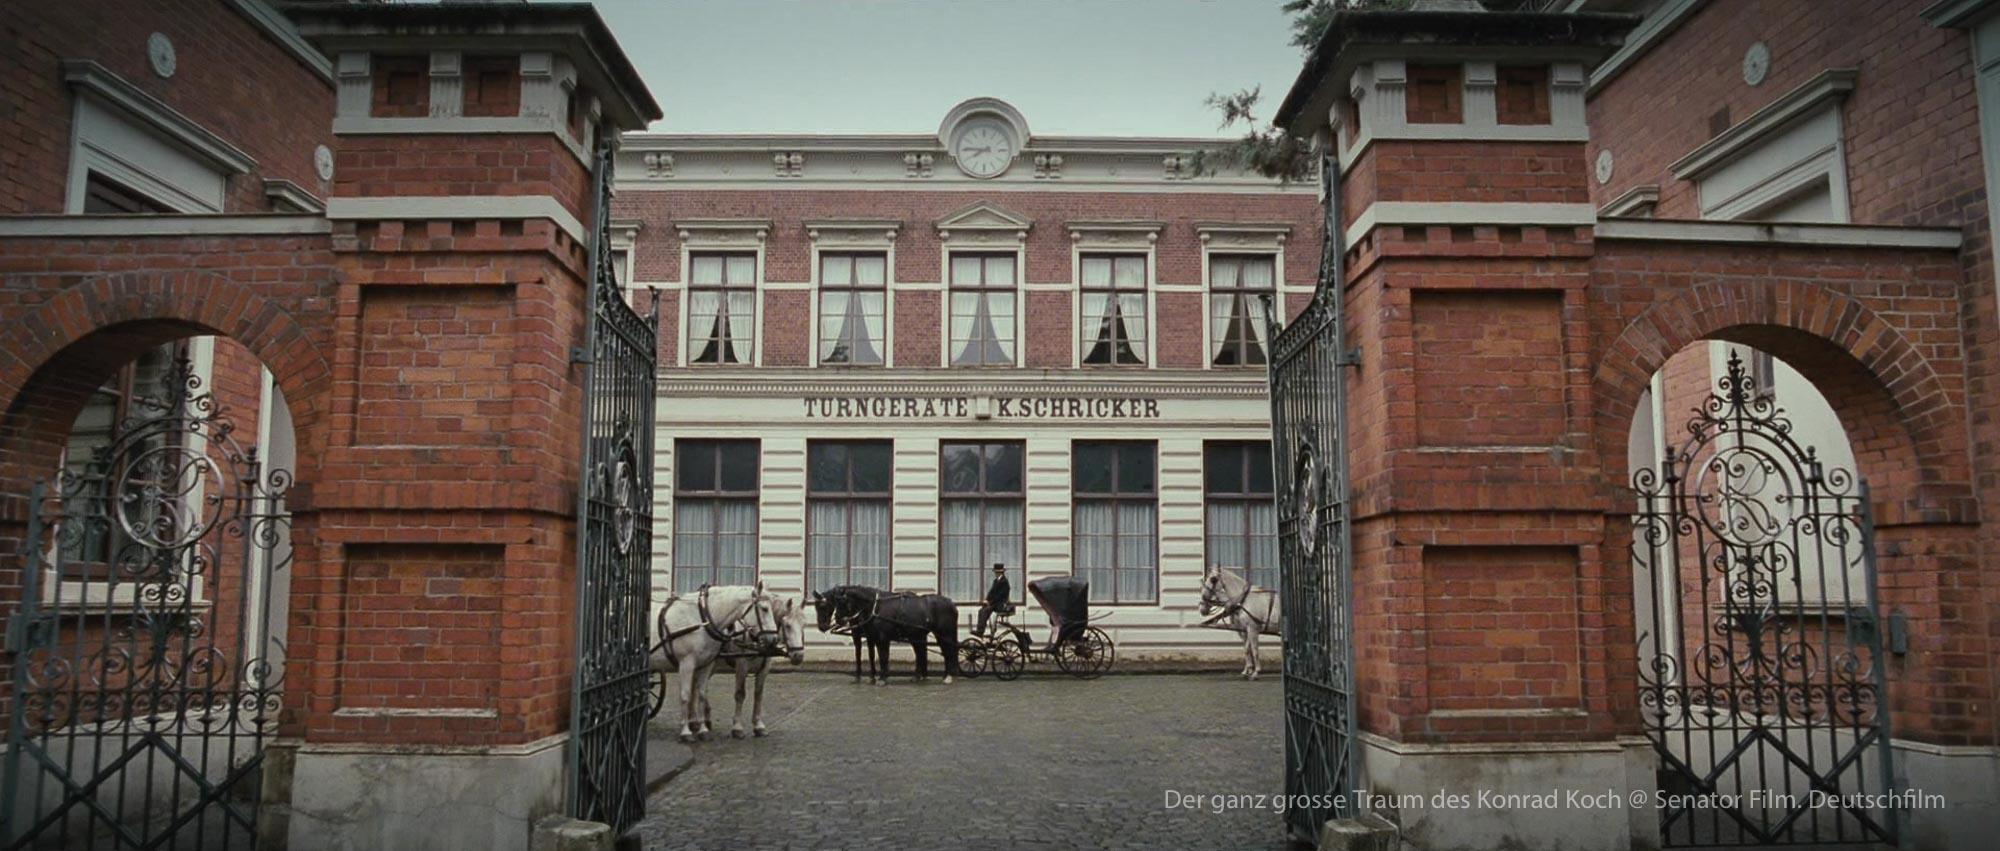 Der Ganz grosse Traum des Konrad Koch Daniel Brühl Filmset Thomas Freudenthal Production Design Szenenbild Hamburg Germany